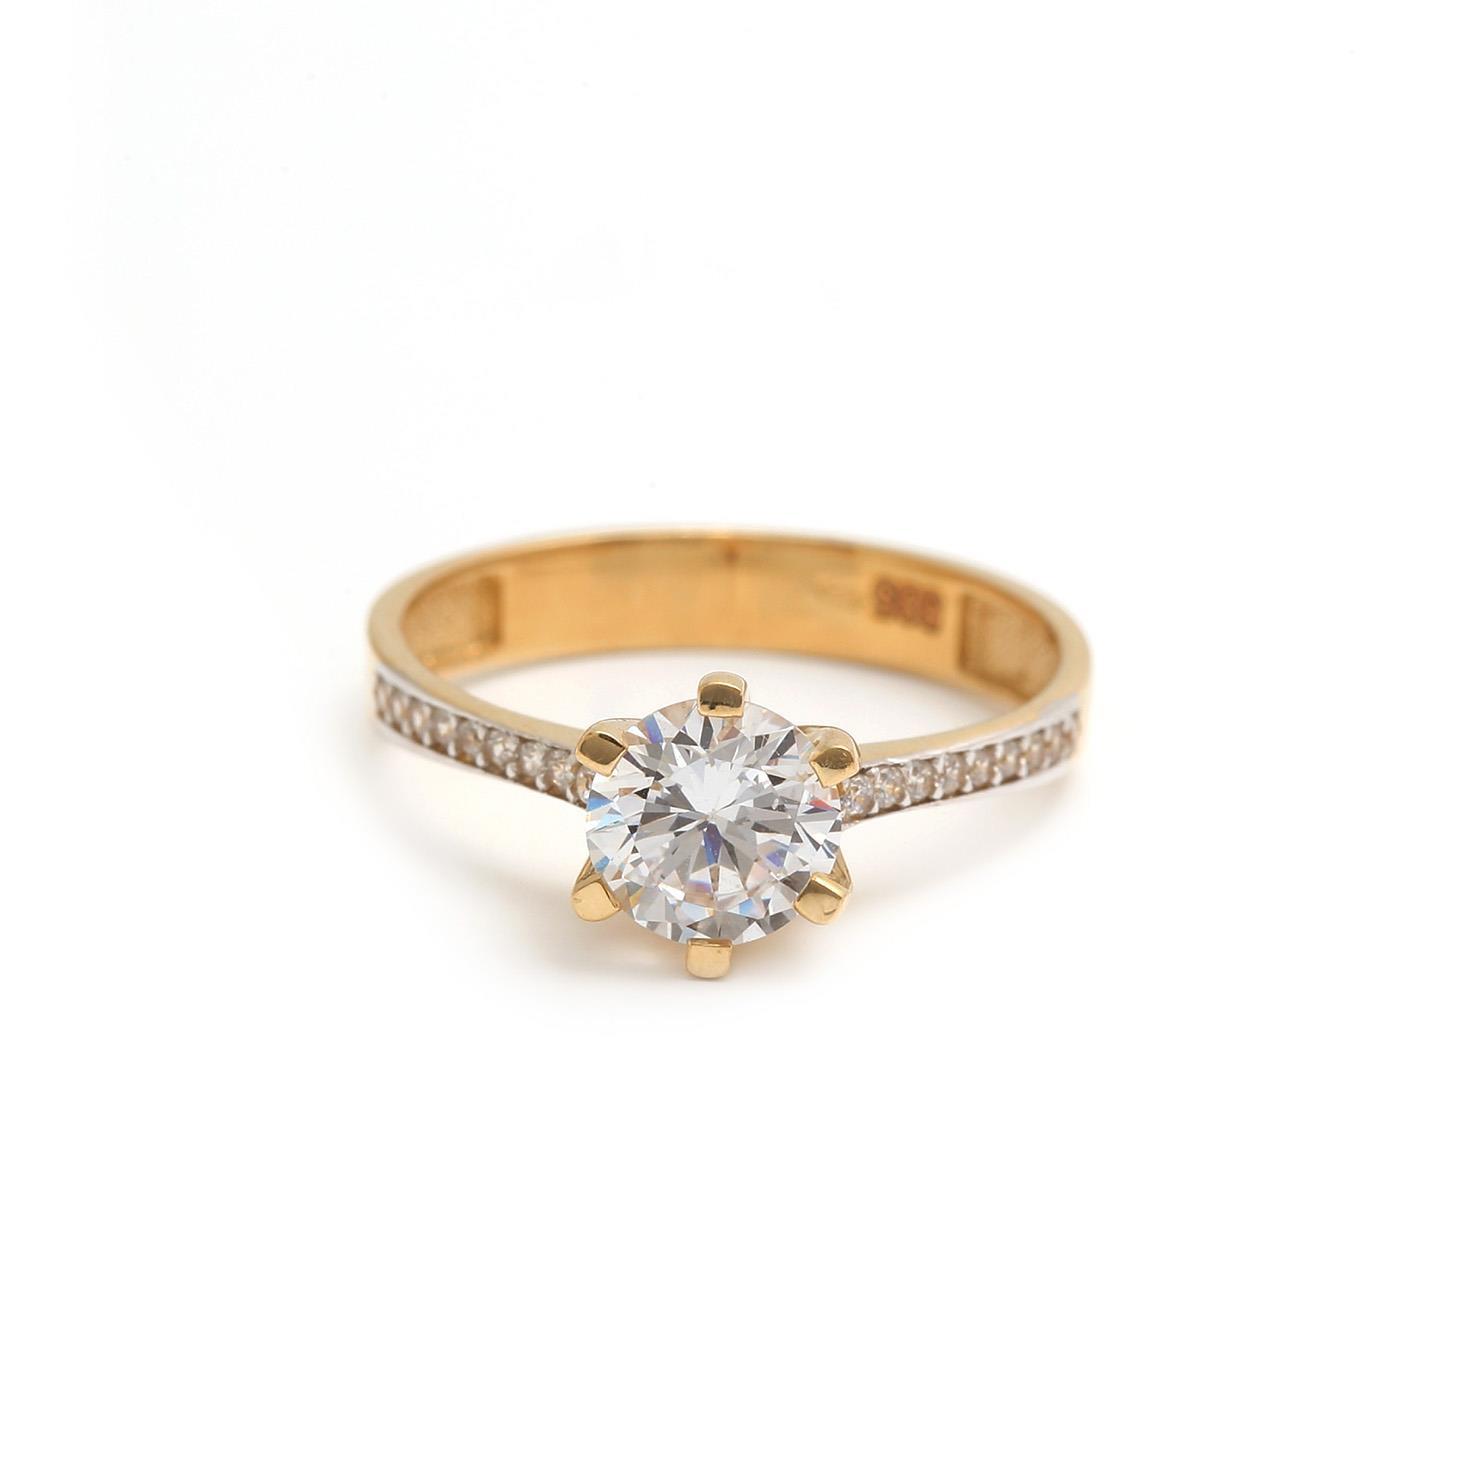 zlatý zásnubný prsteň azucena zlatý zásnubný prsteň azucena 1 ... 1f48d87f8cc